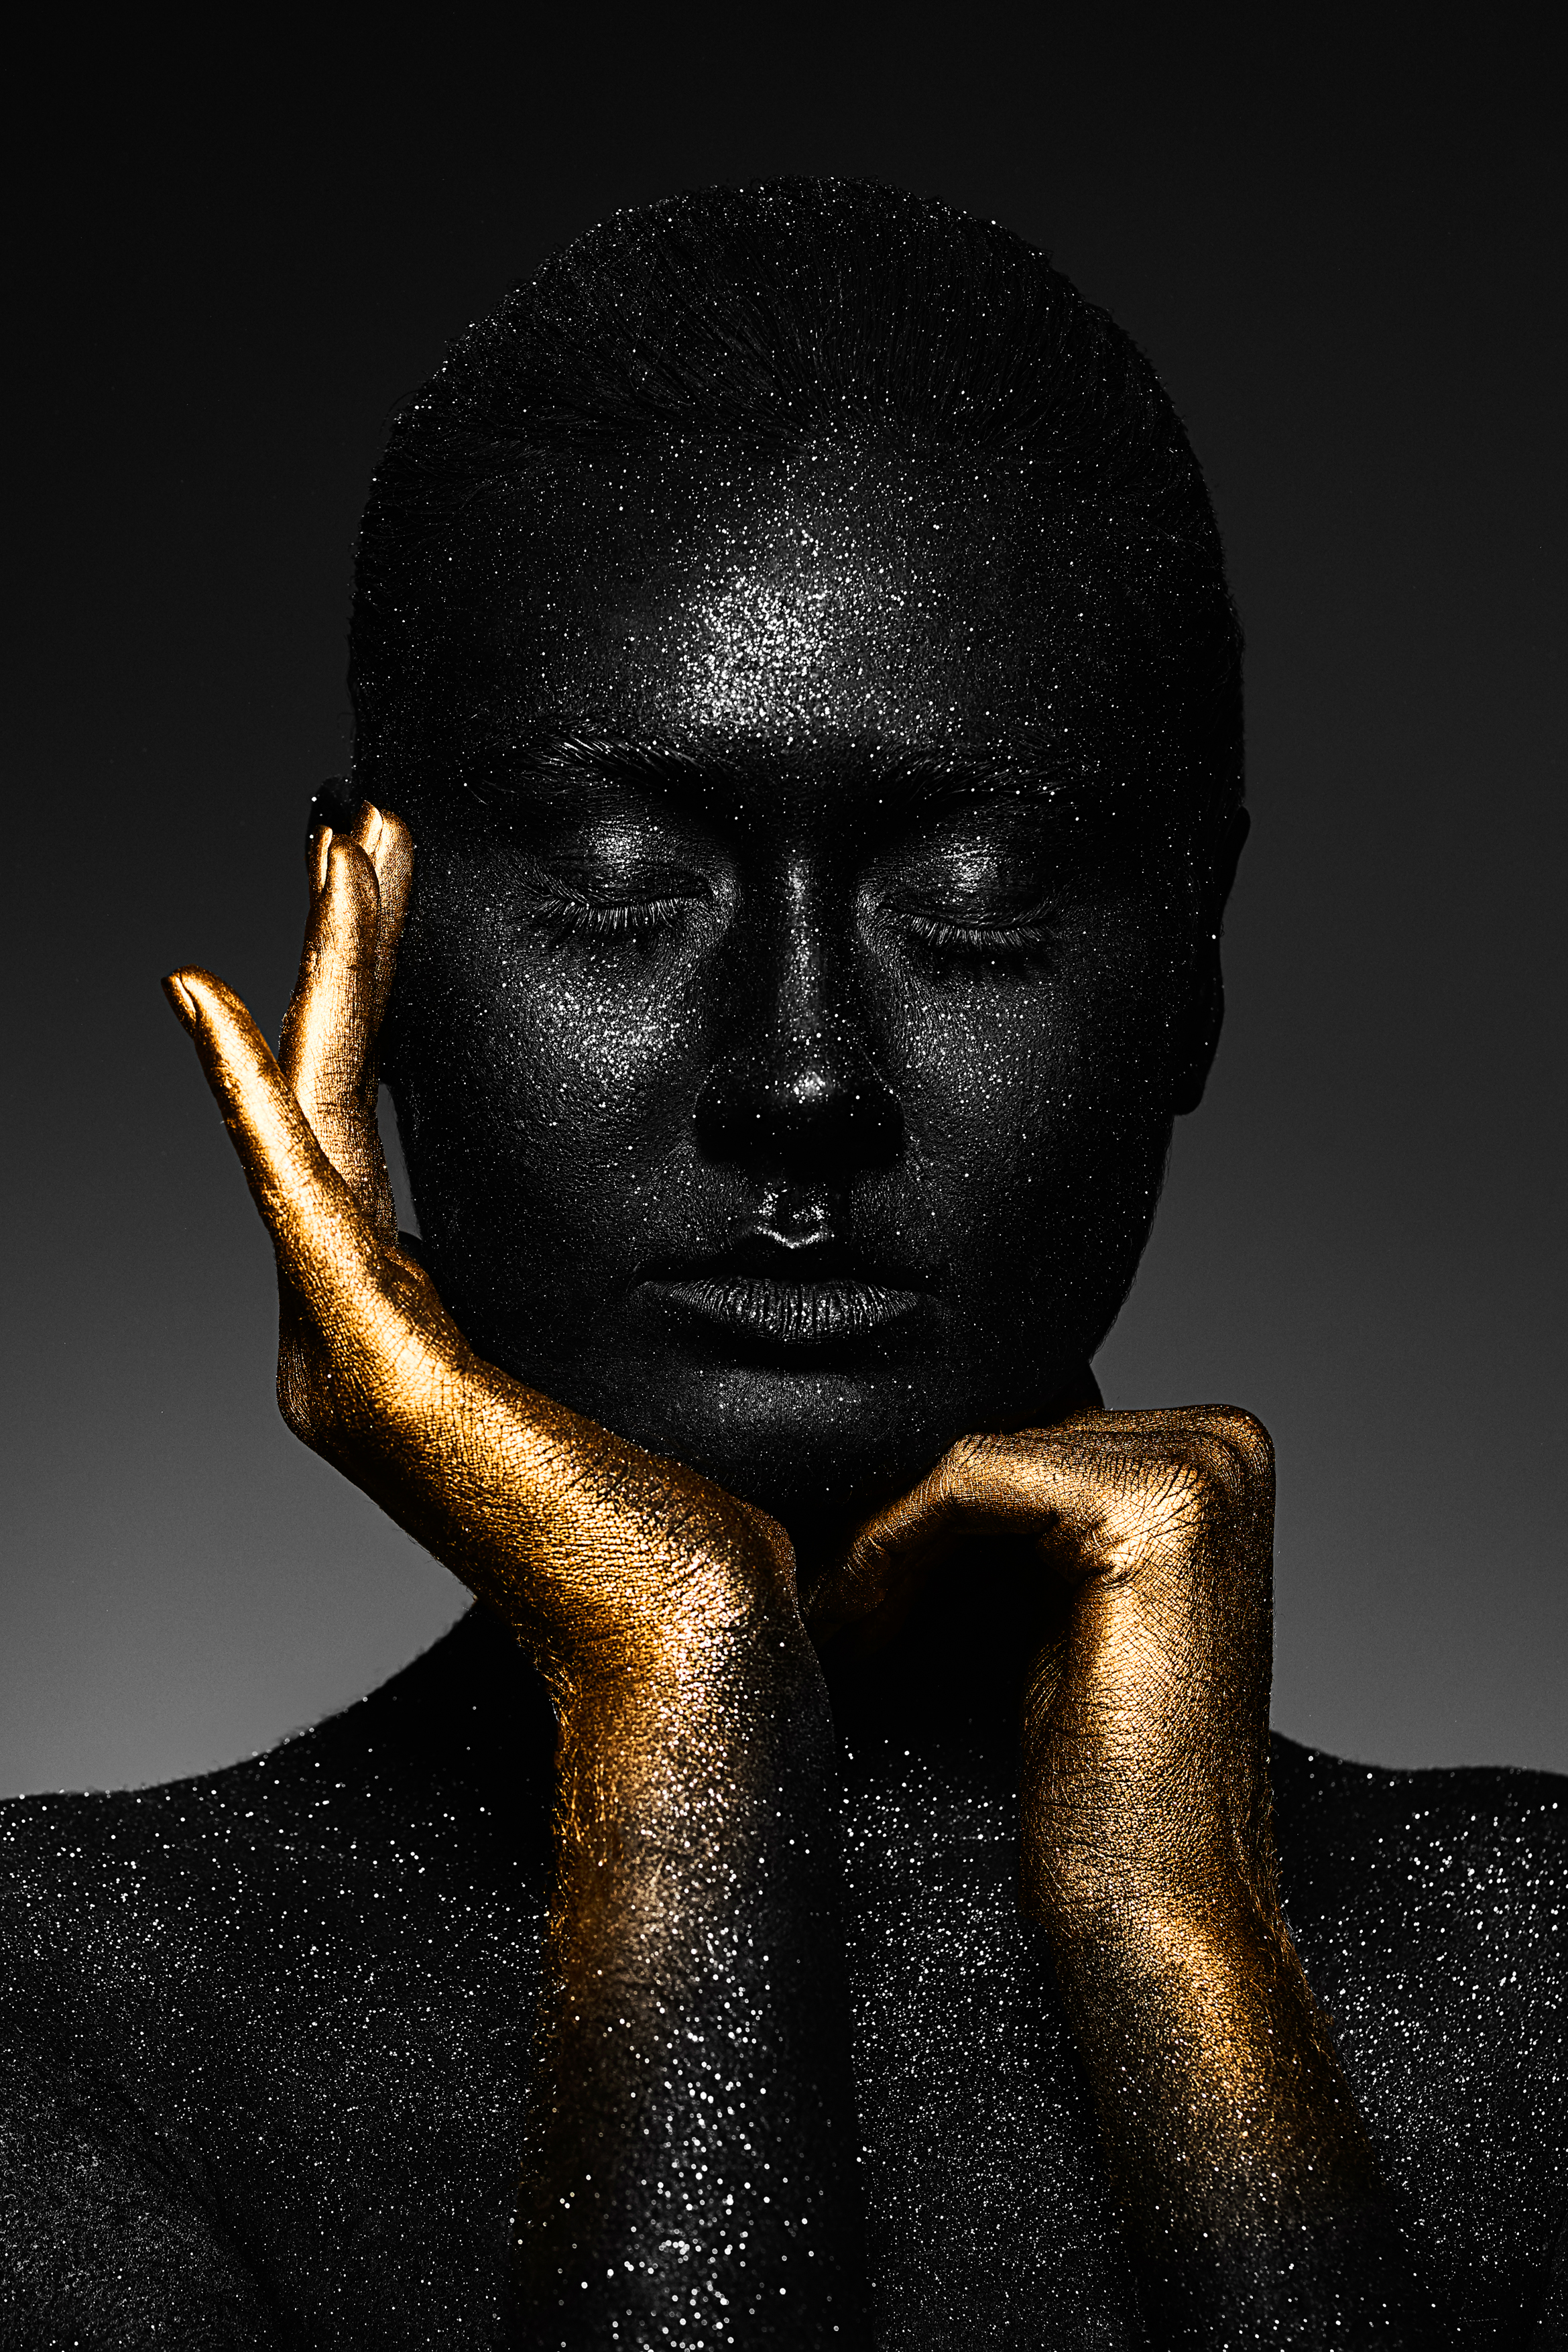 Nora-Orthofer-Black-Project-09.jpg